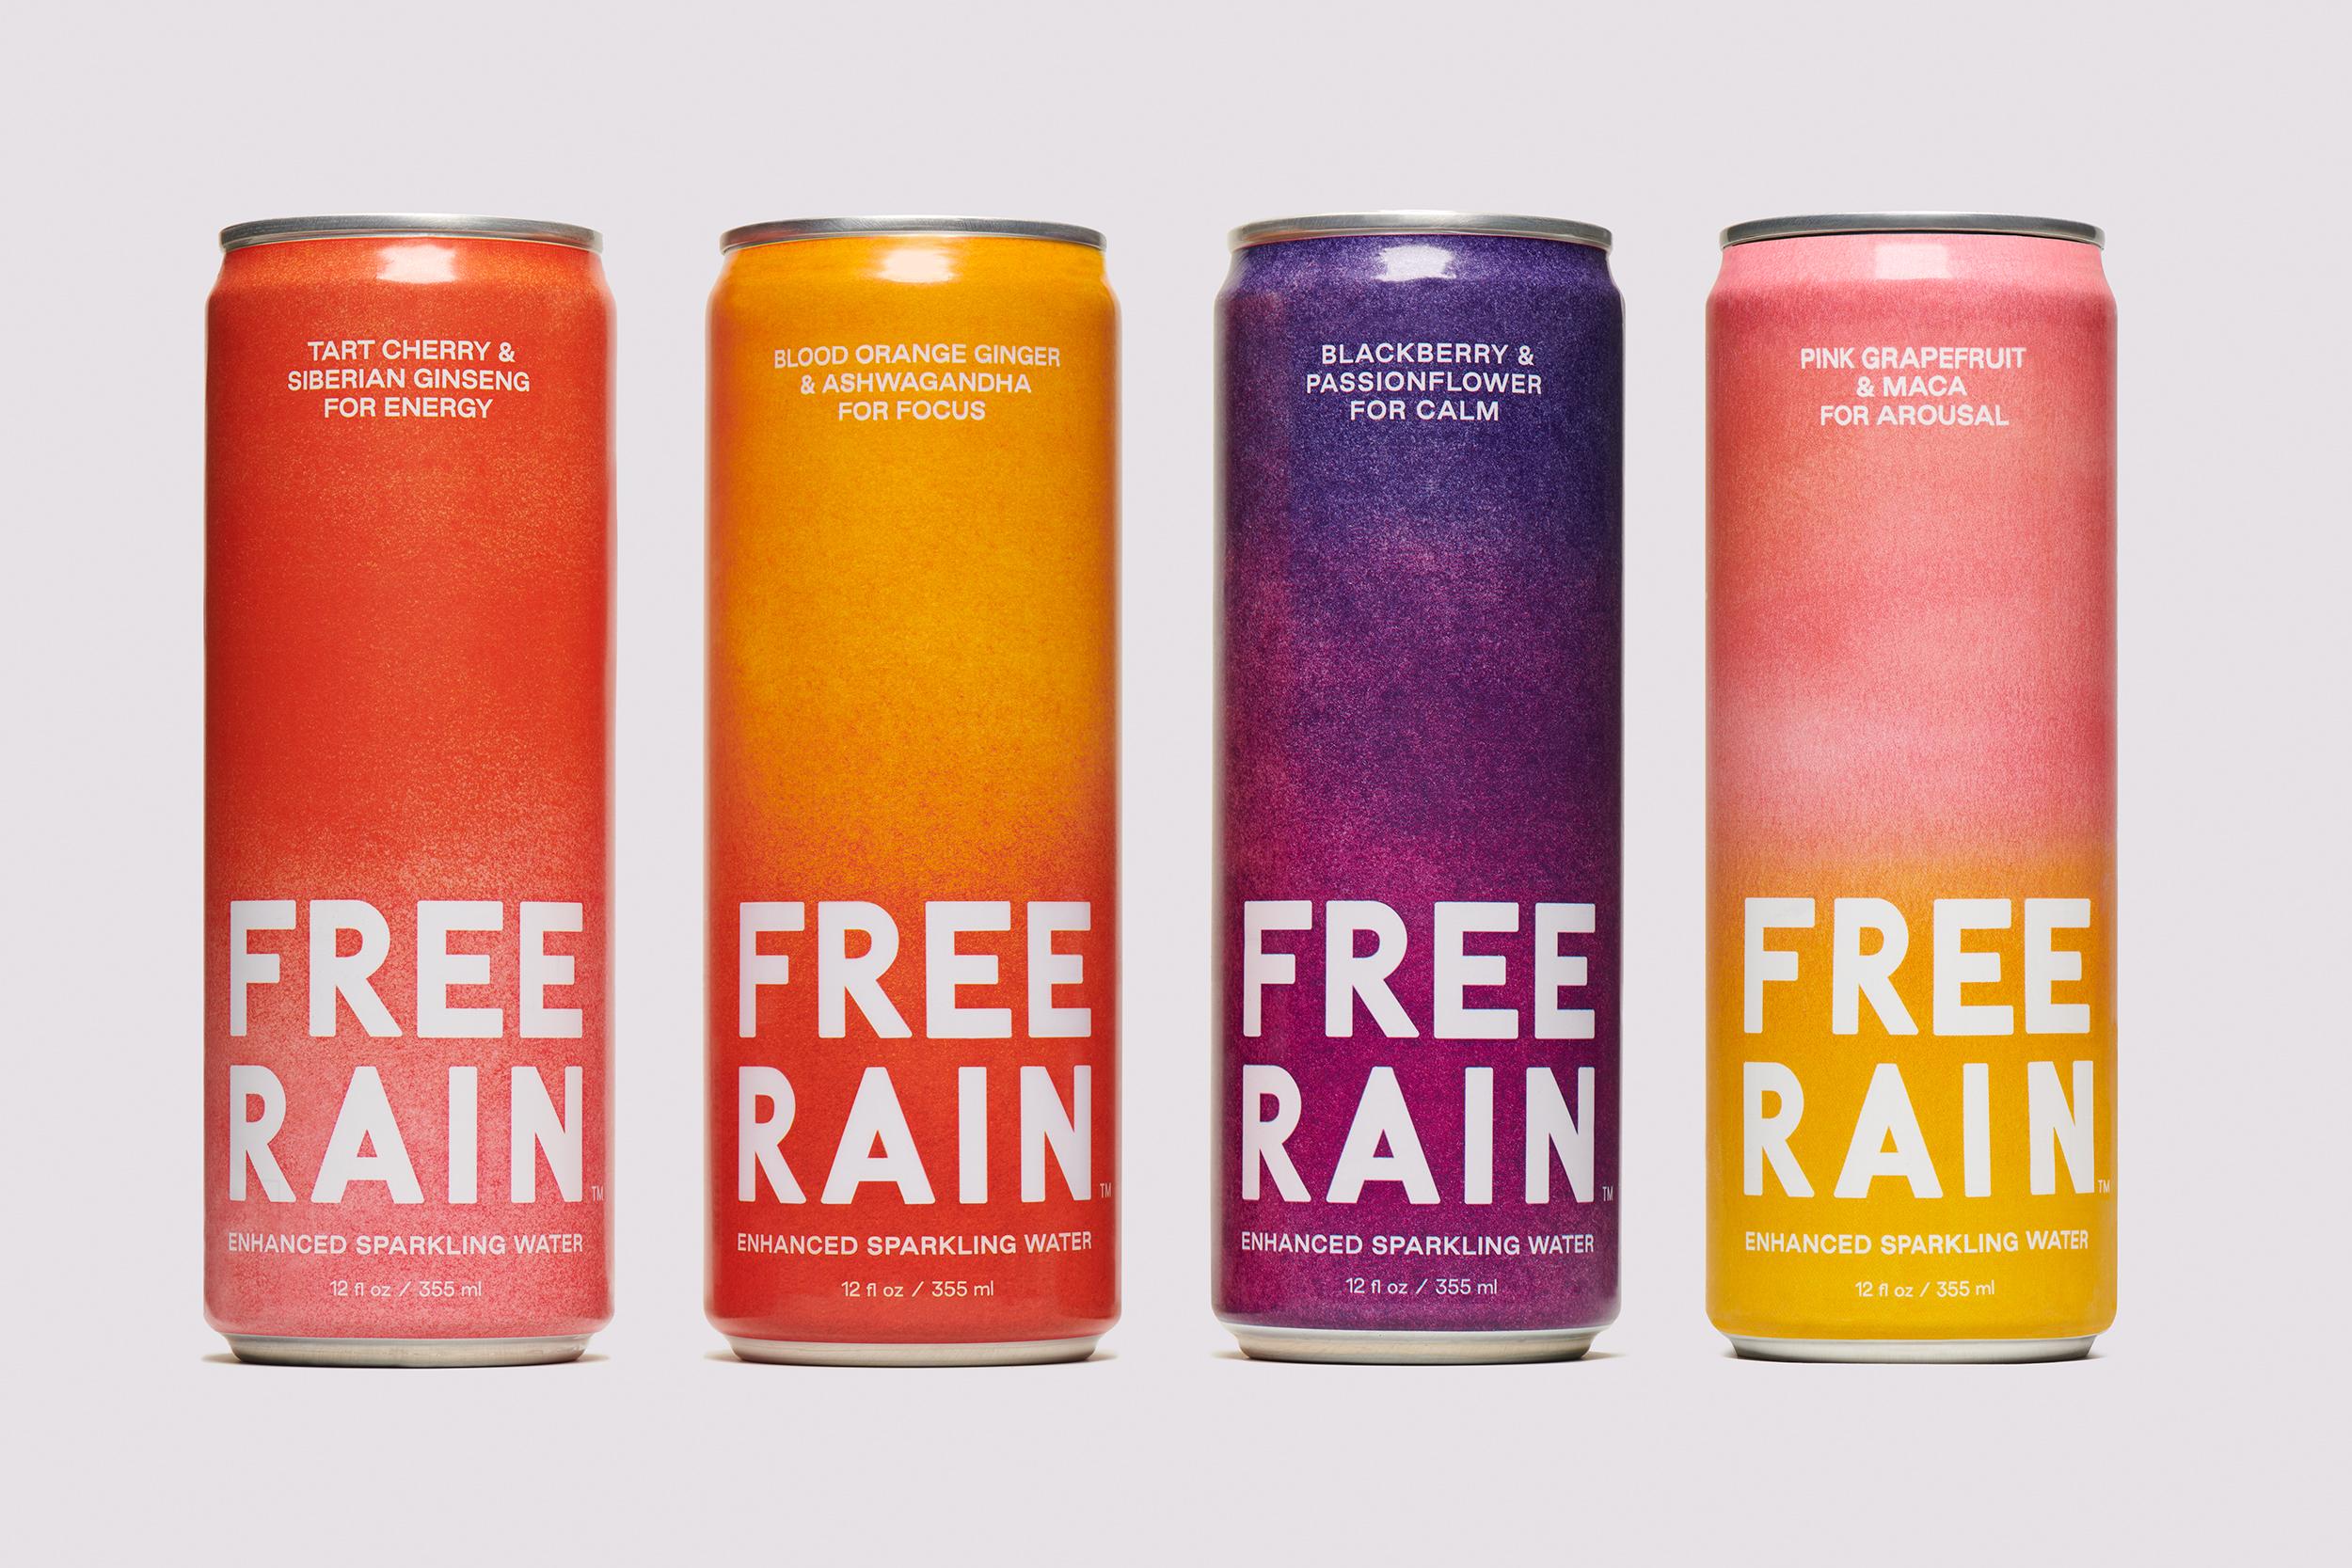 Enhanced Sparkling Water Brand FREE RAIN Announces Launch of 'Arousal'